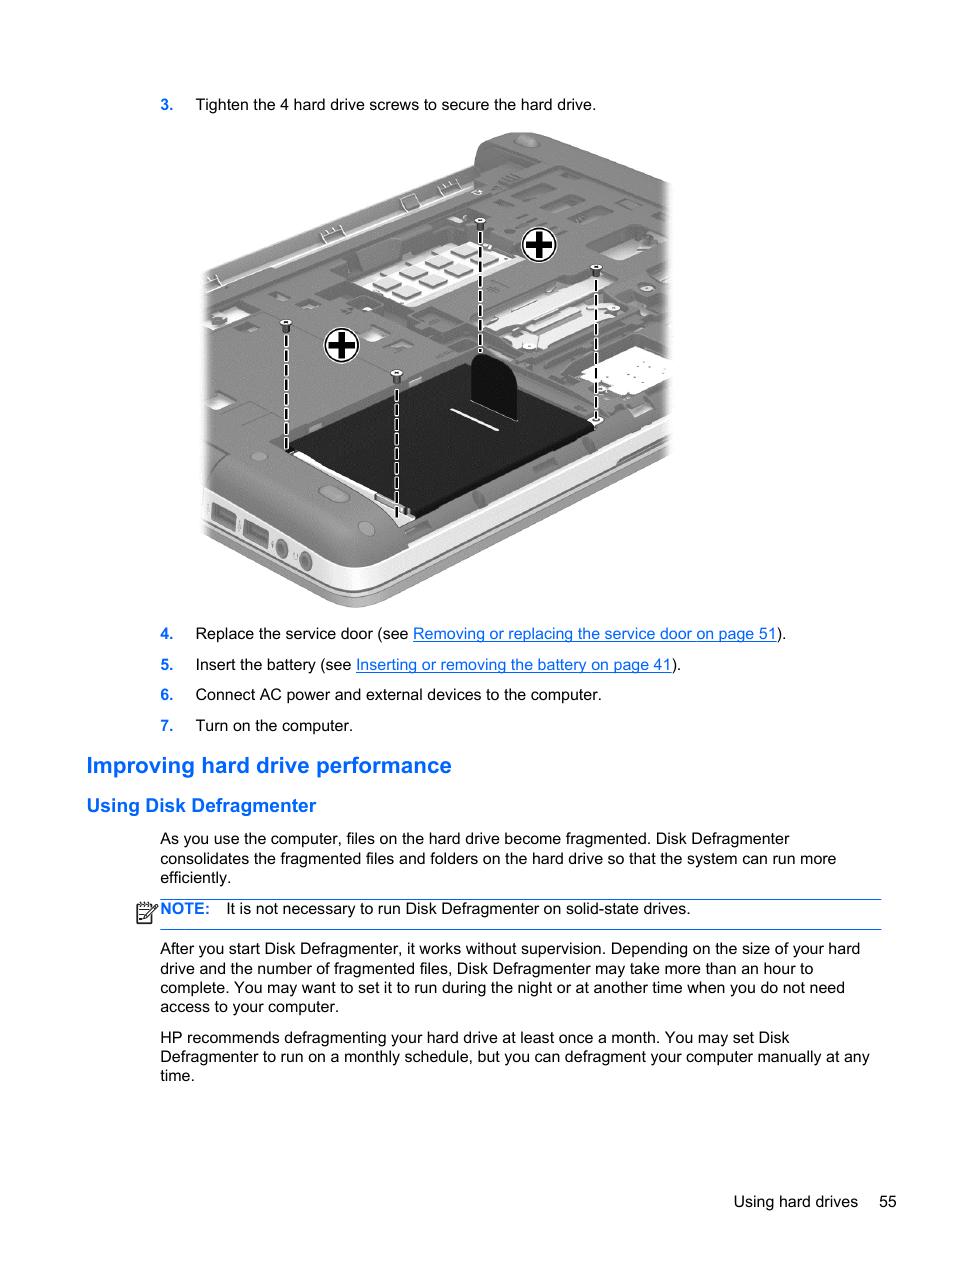 Improving hard drive performance, Using disk defragmenter